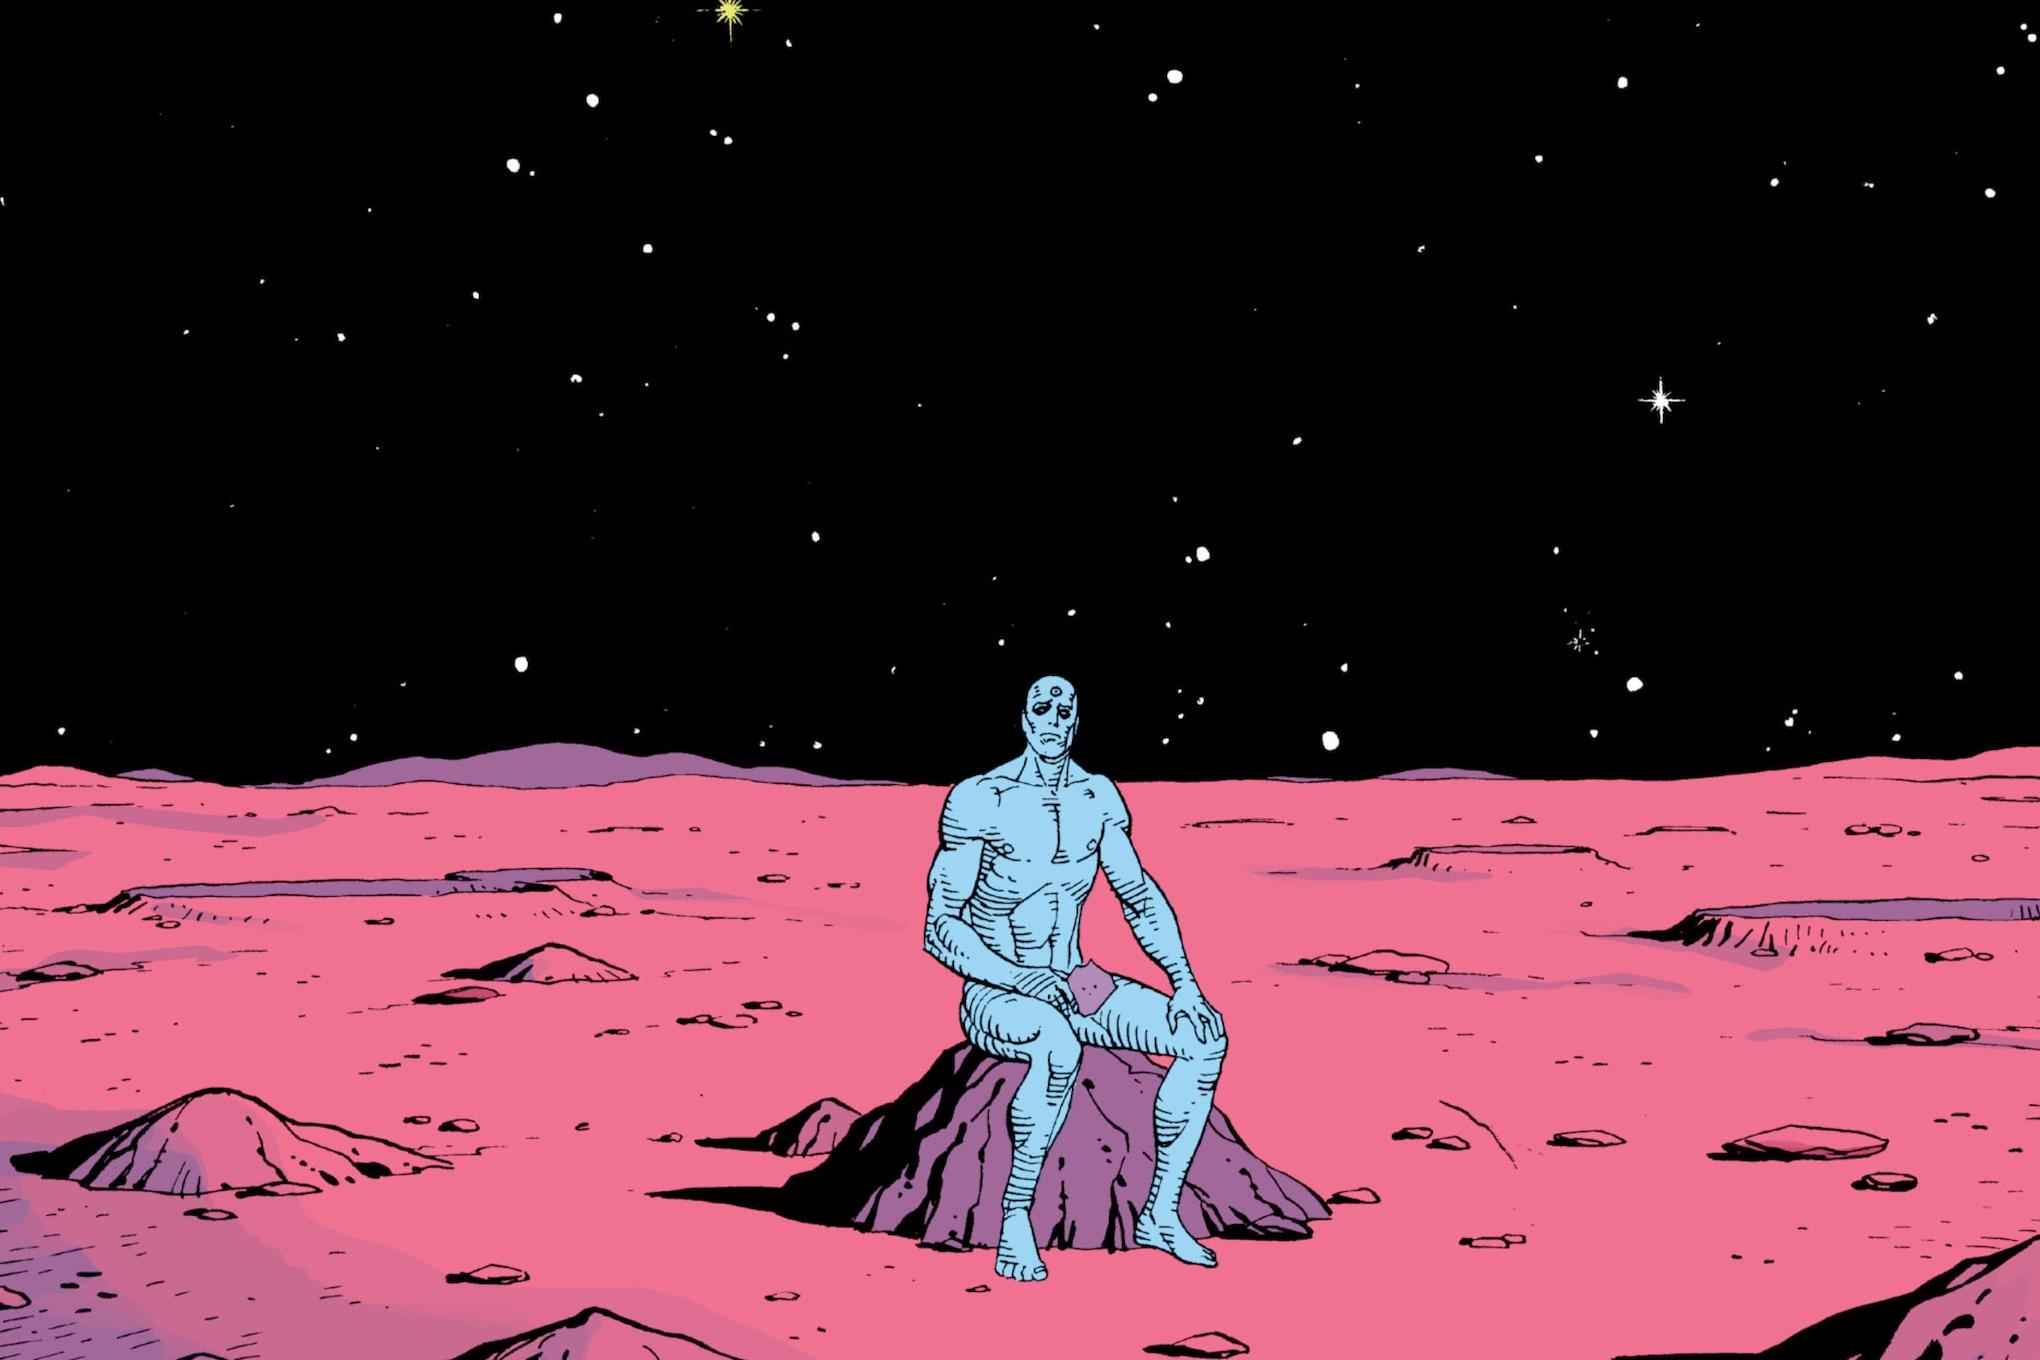 Tachyons are Doctor Manhattan's kryptonite